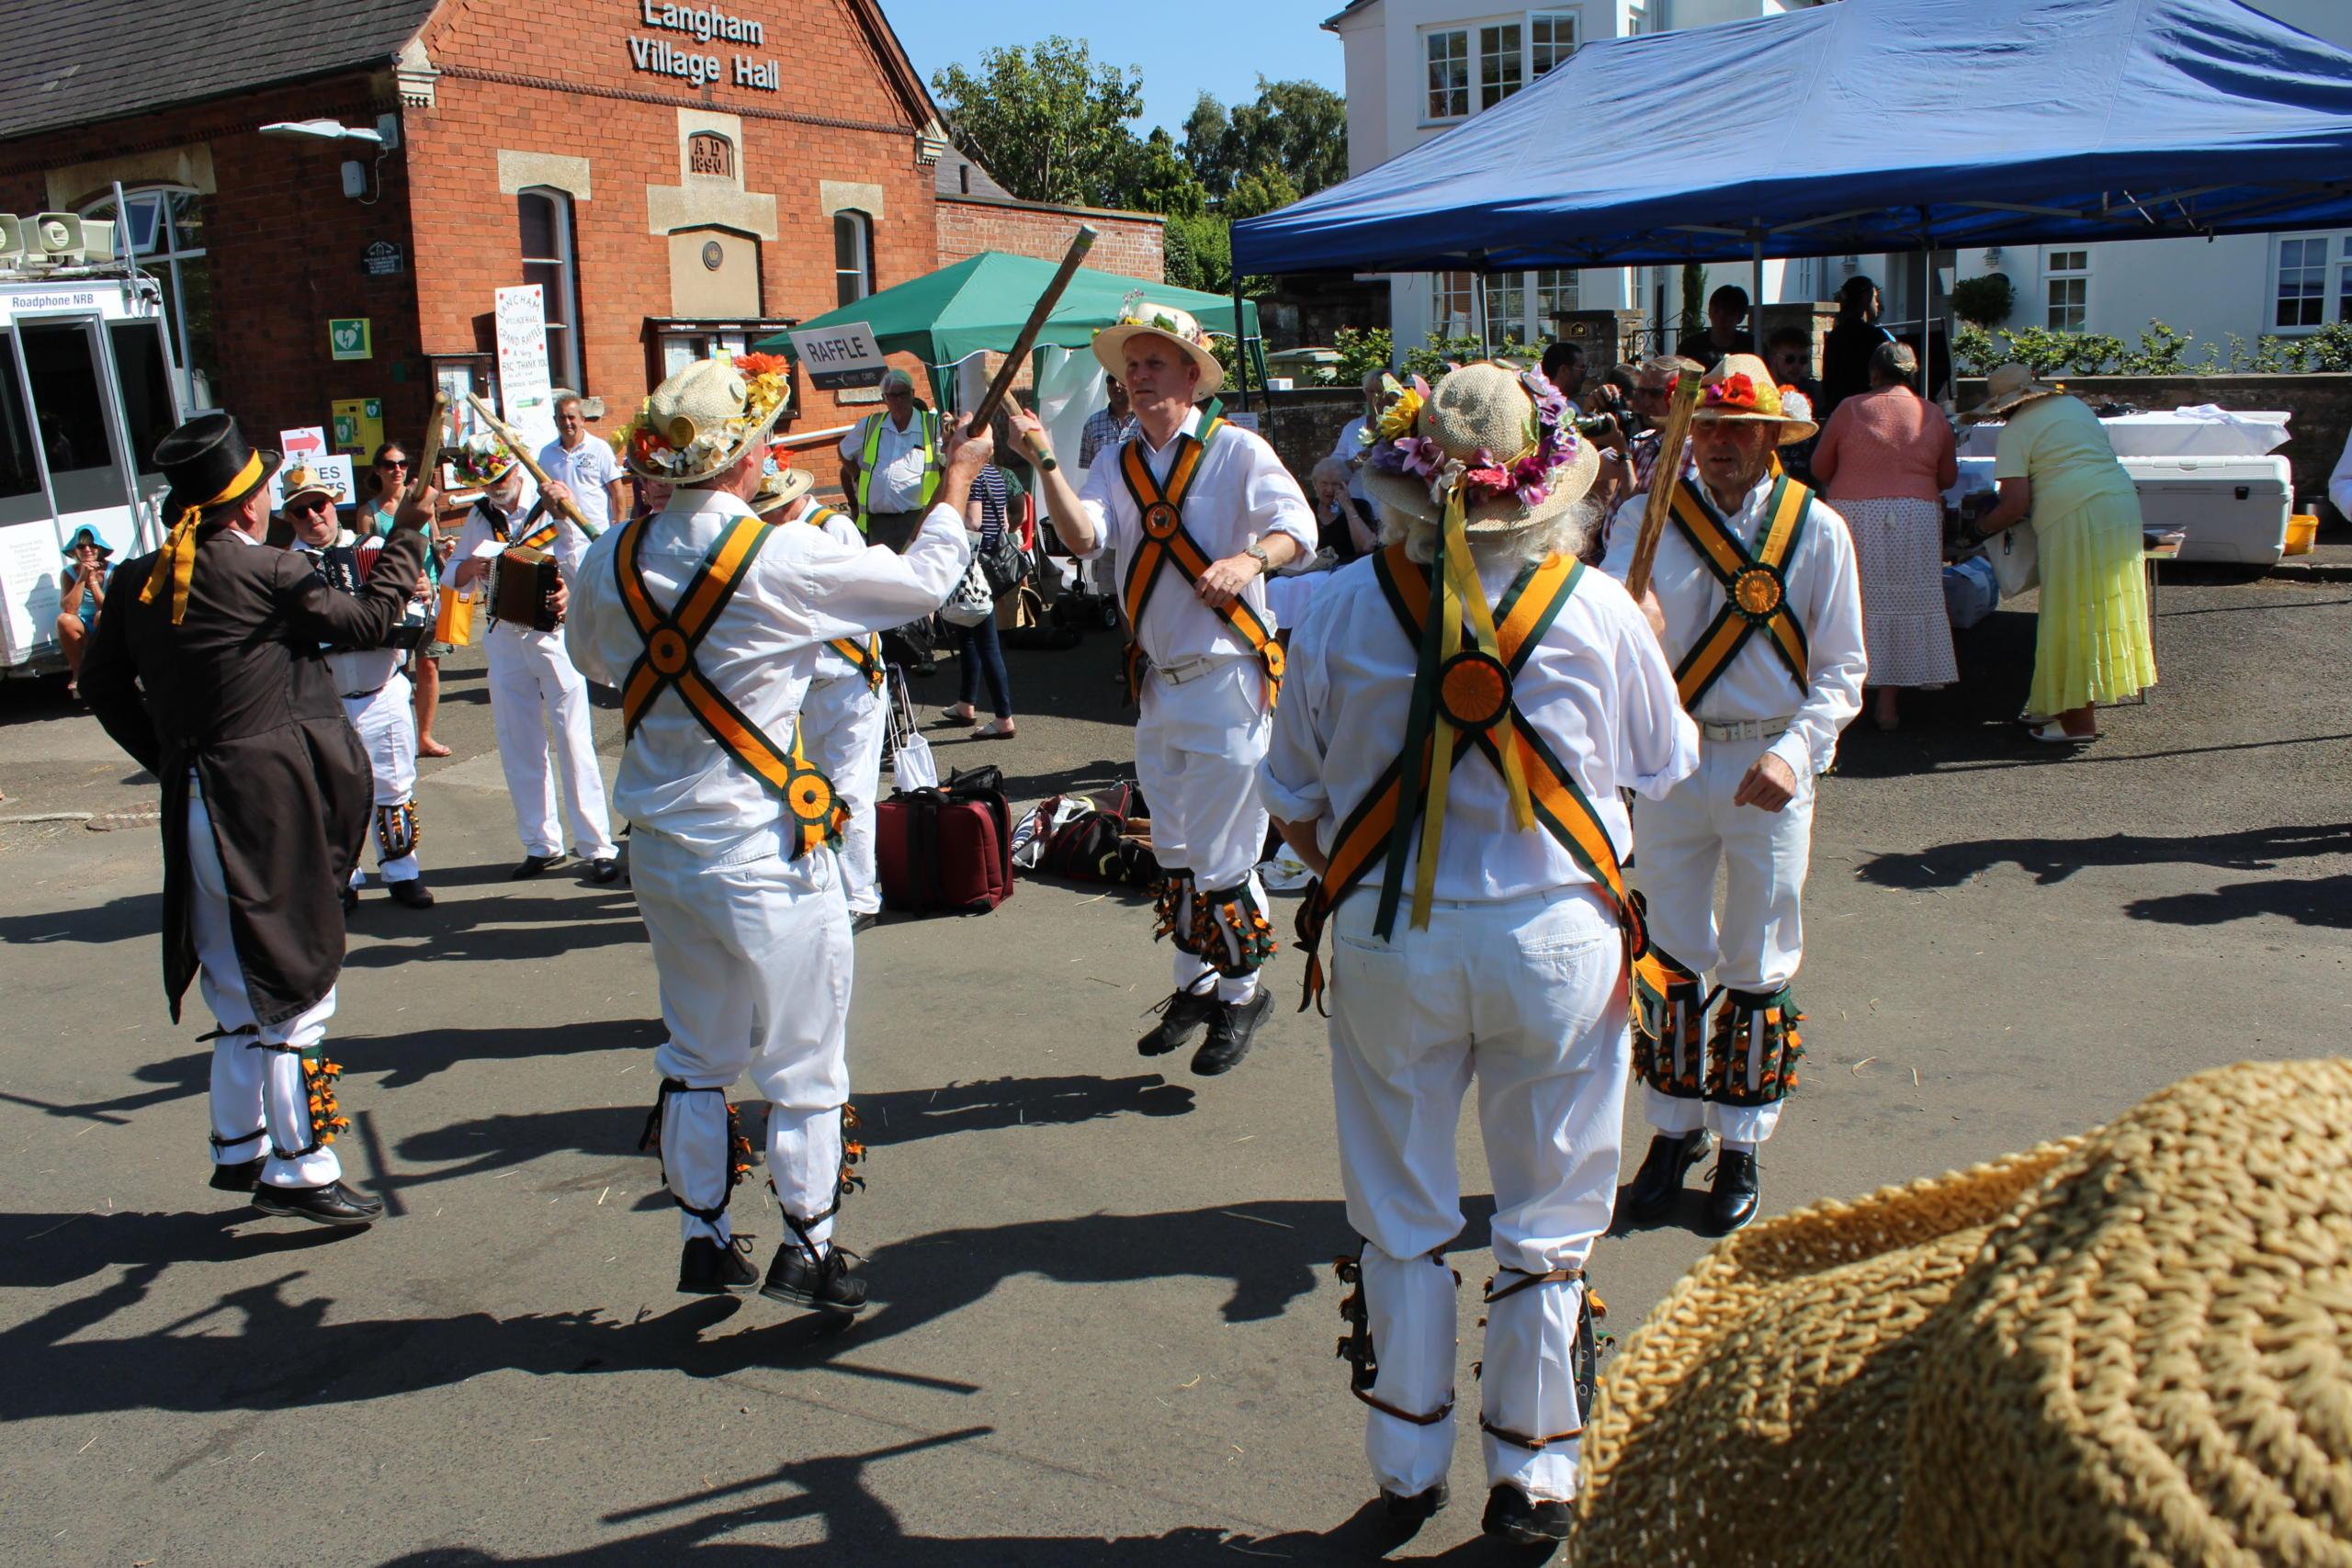 Langham Street Market event Morris Dancers